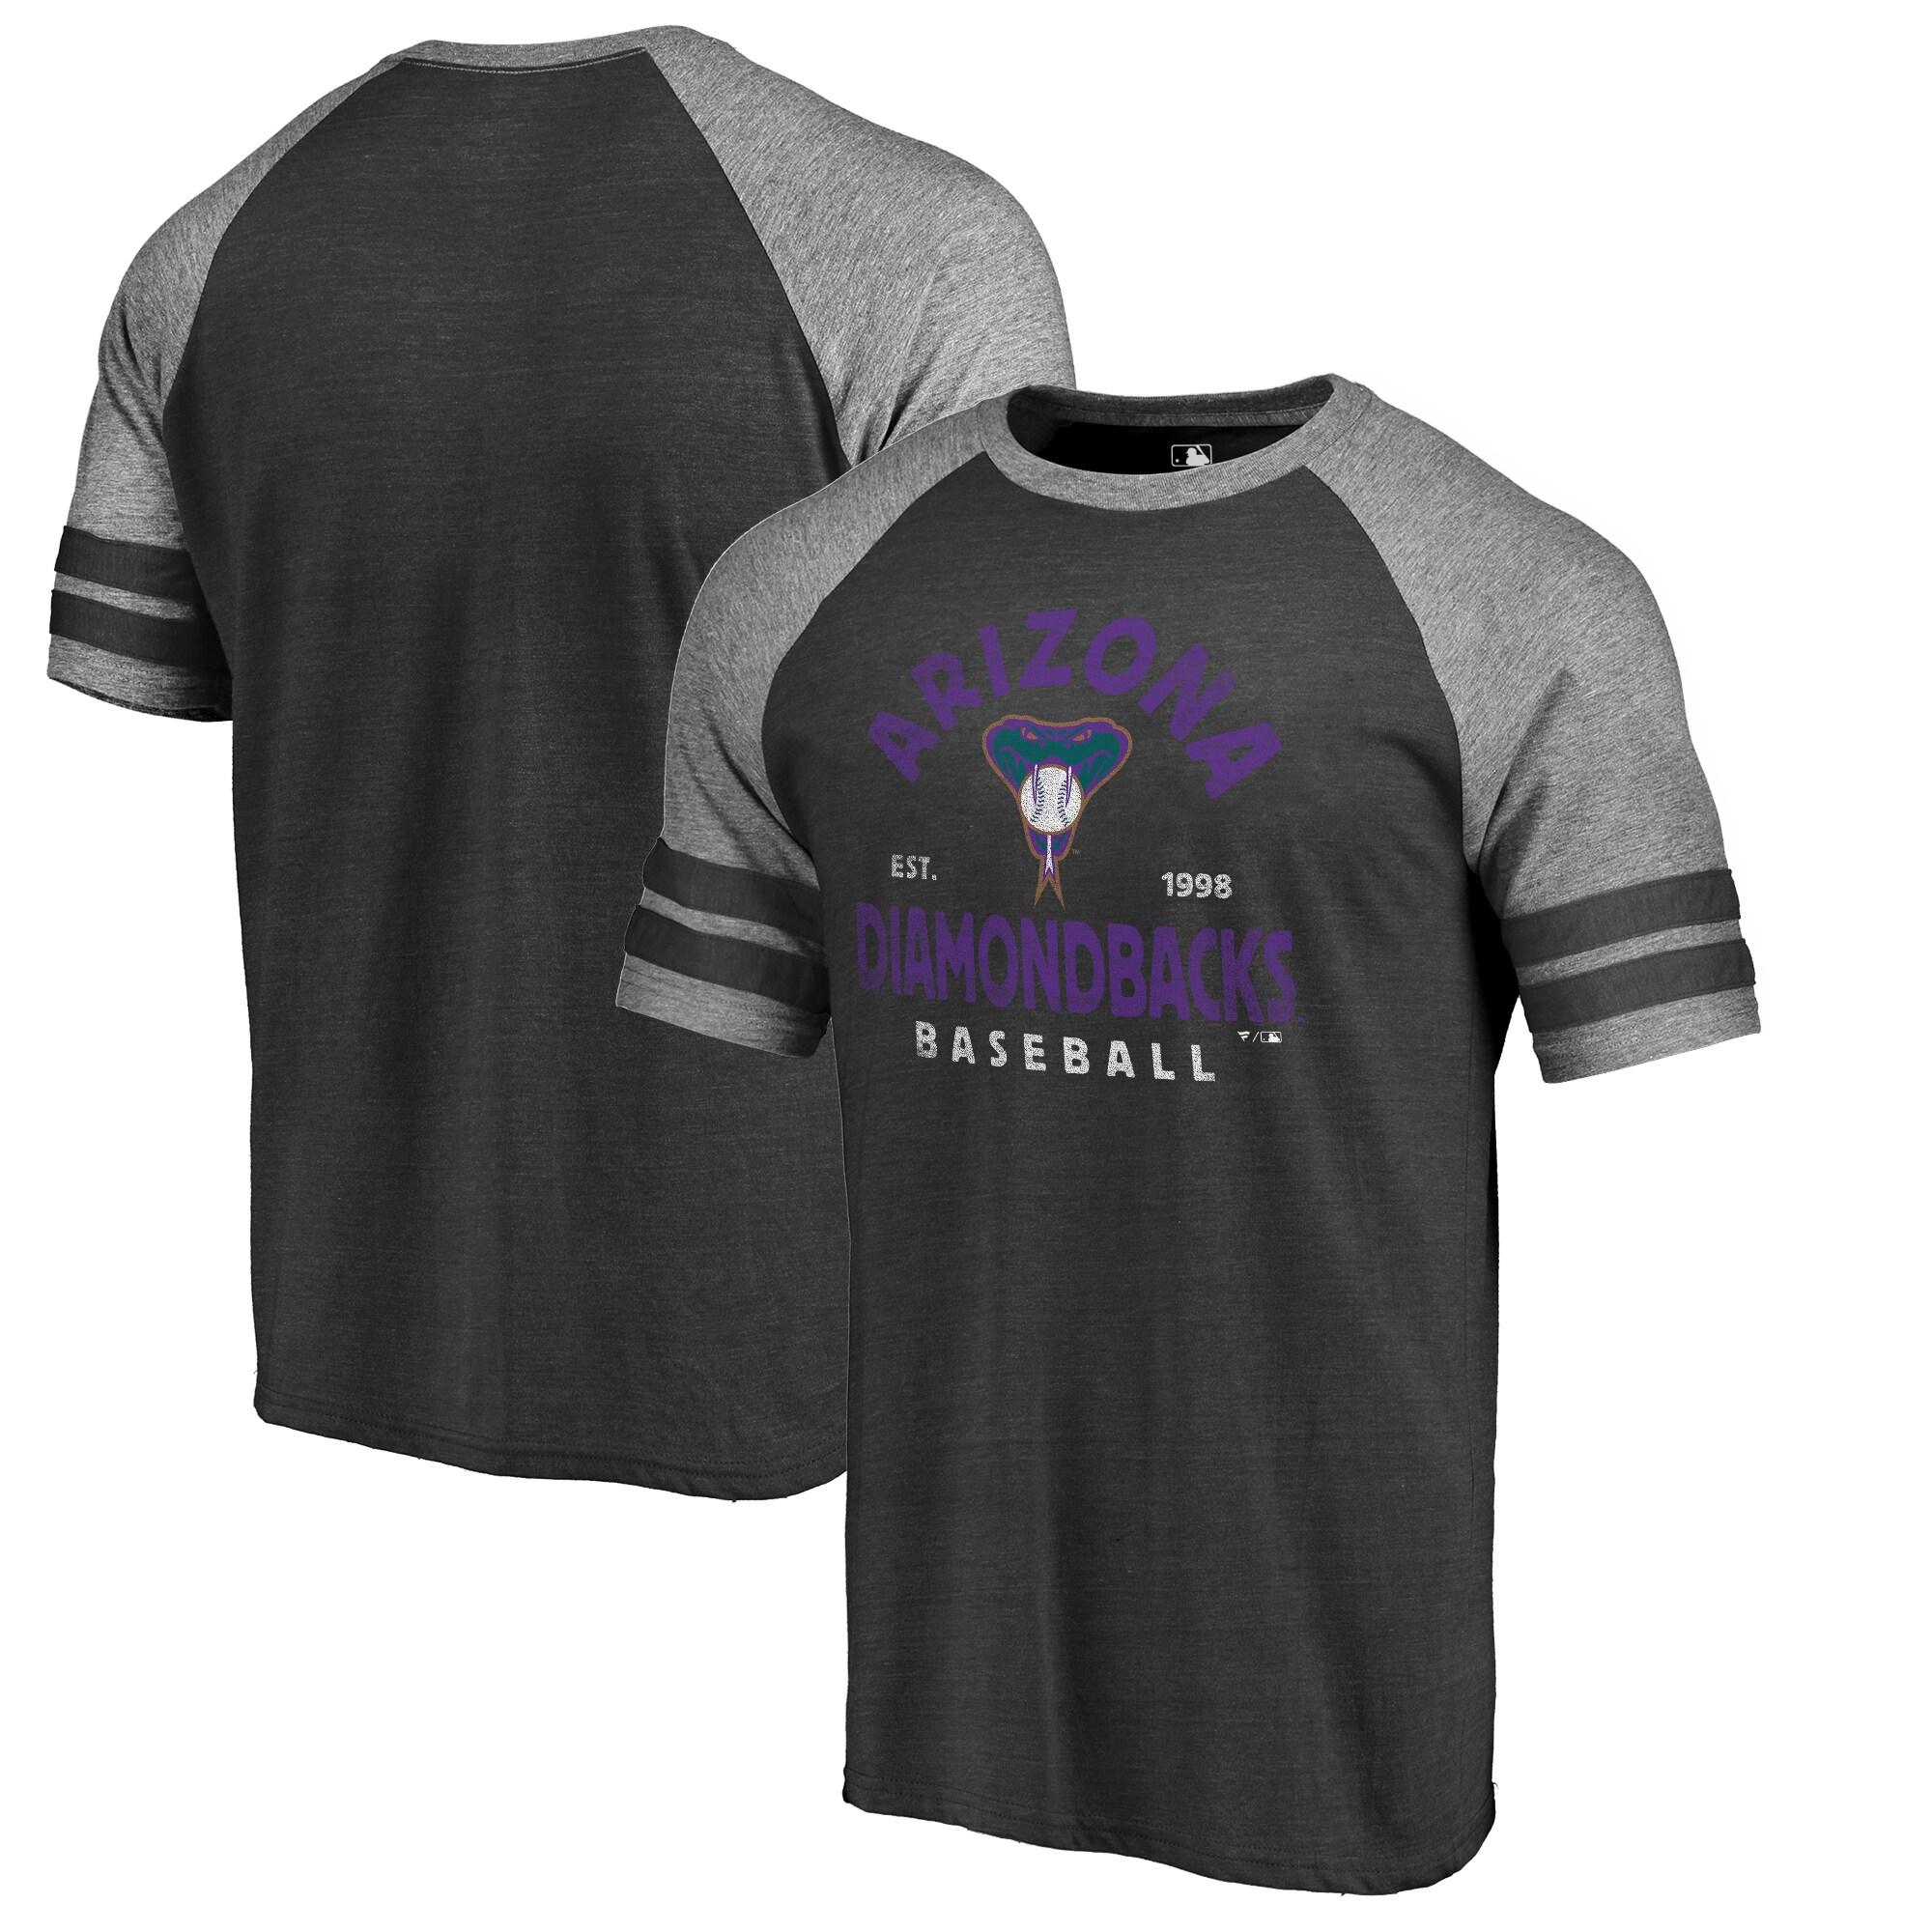 Arizona Diamondbacks Fanatics Branded Cooperstown Collection Vintage Arch Tri-Blend Raglan T-Shirt - Black